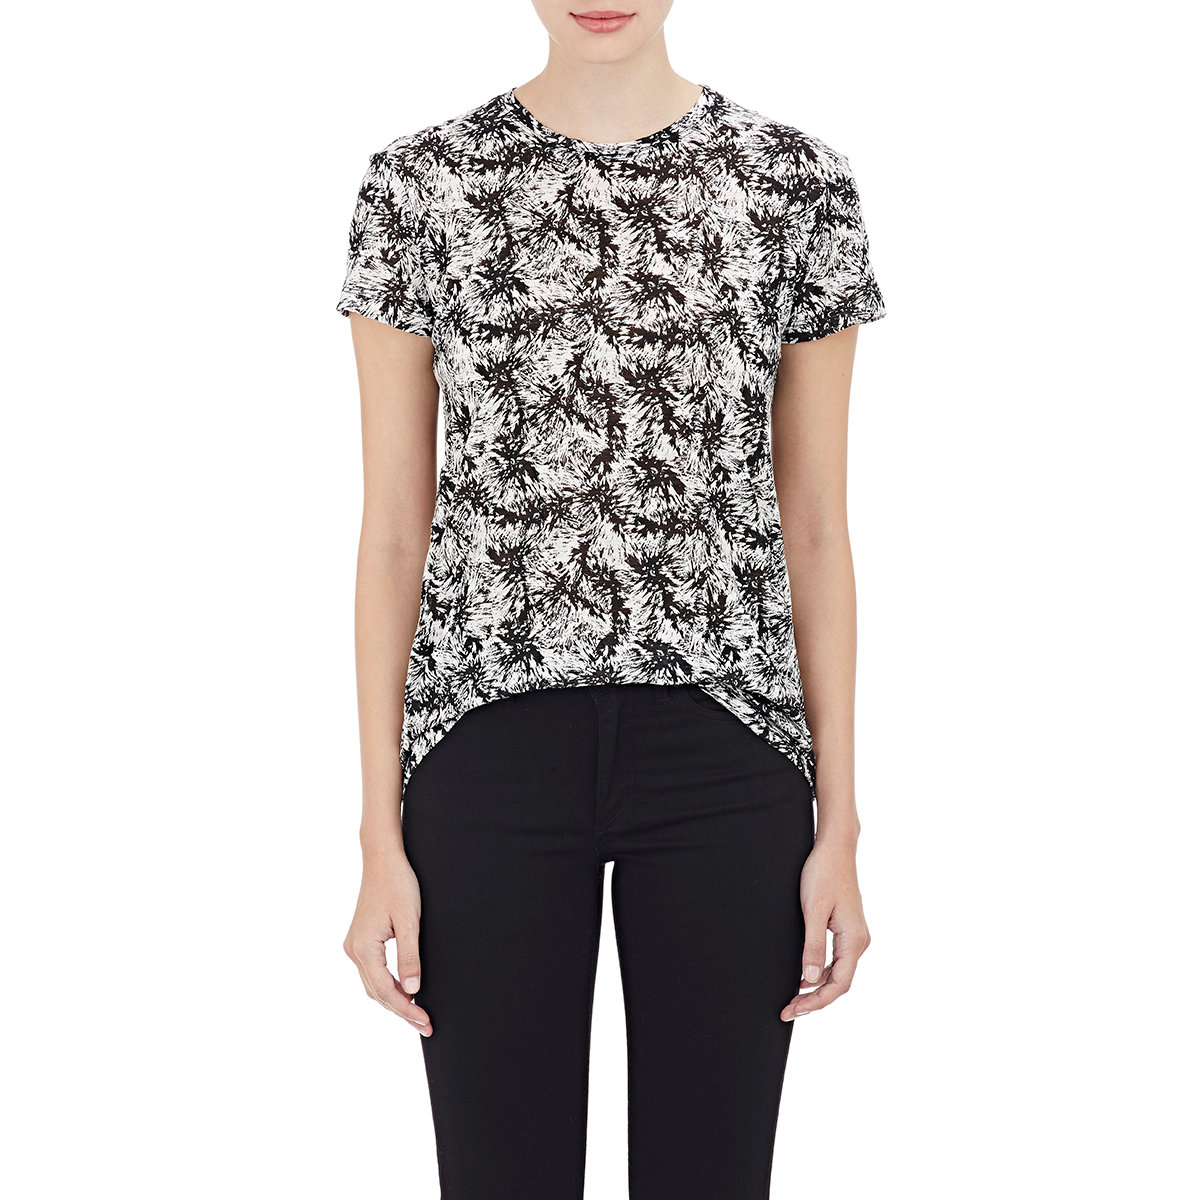 Proenza schouler slub jersey t shirt in black white lyst for What is a slub shirt